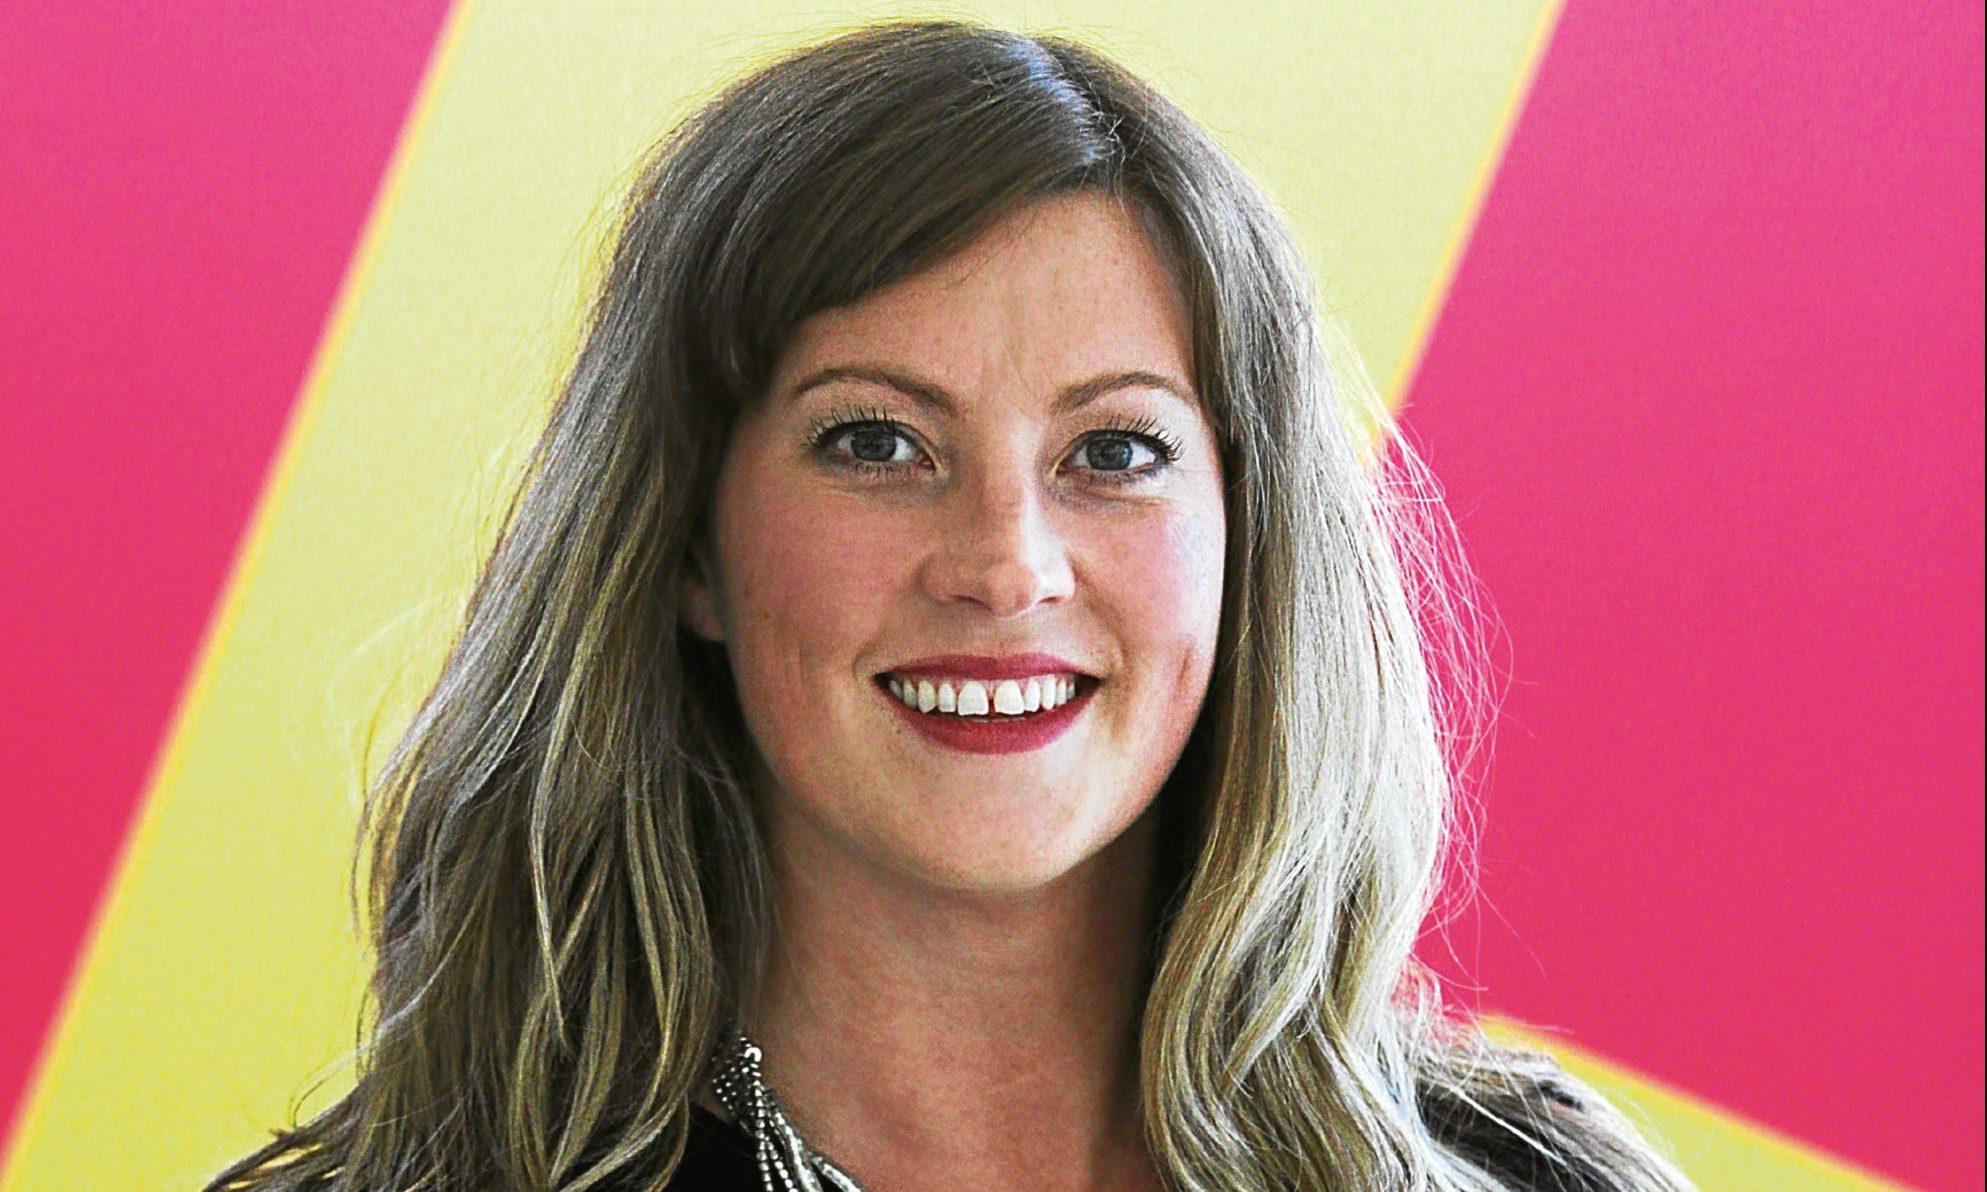 Rosie Ivins, Breakthrough's senior schools coordinator